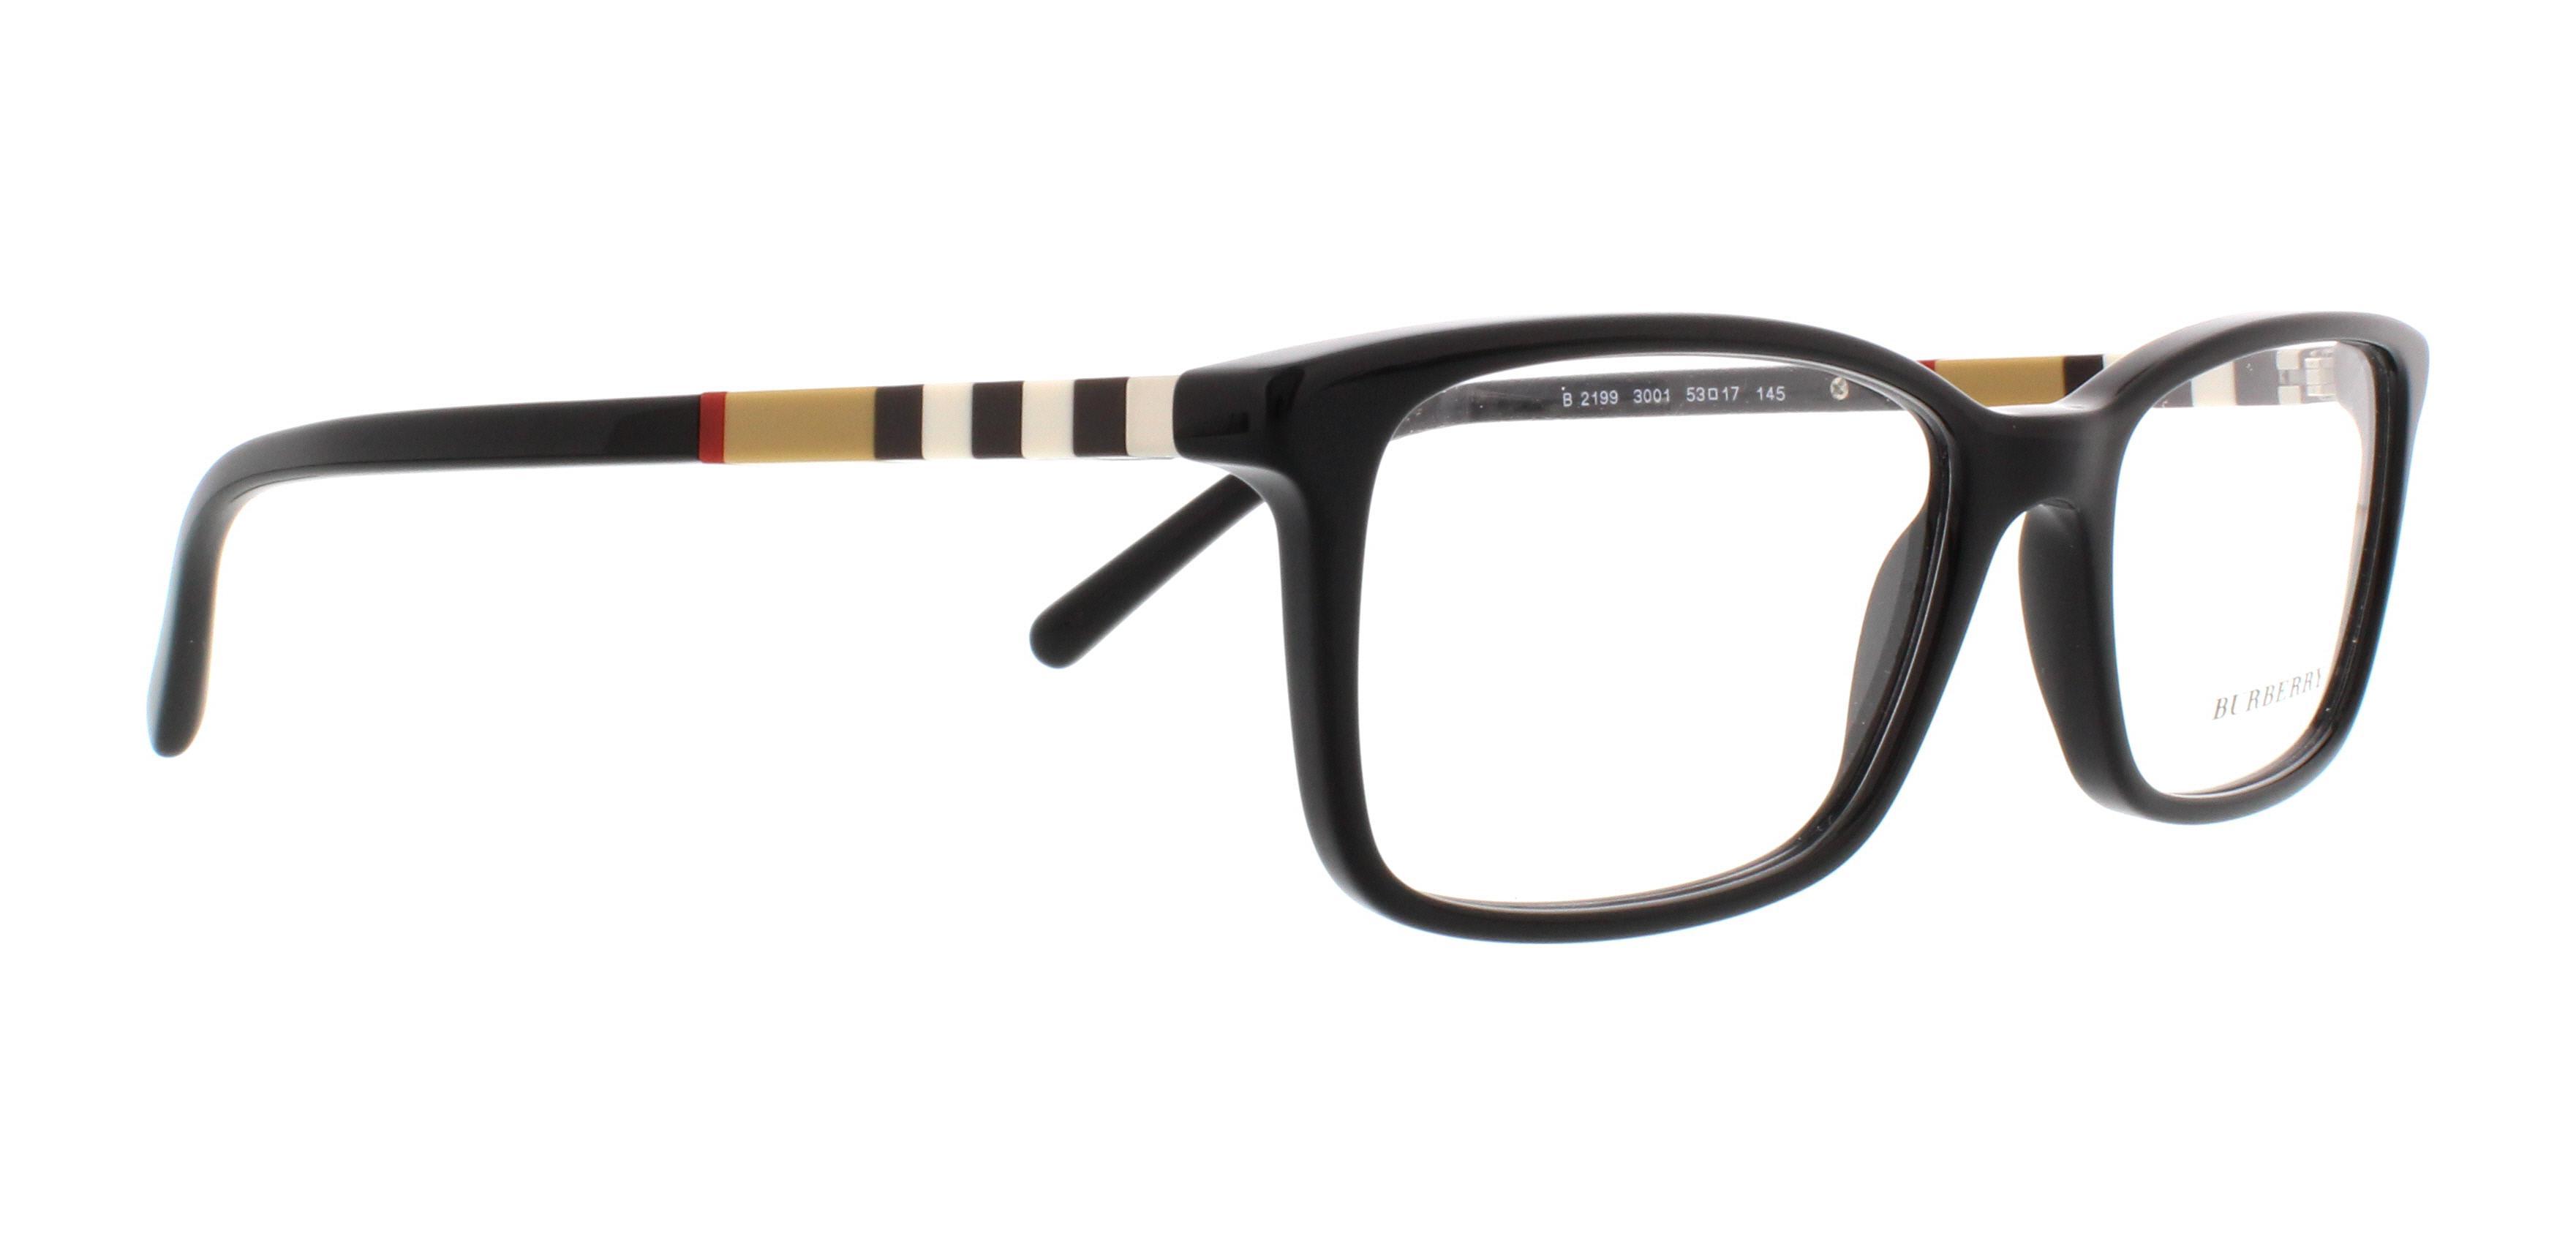 0a7b116d64b3 Designer frames outlet burberry jpg 3522x1716 Burberry eyeglasses women